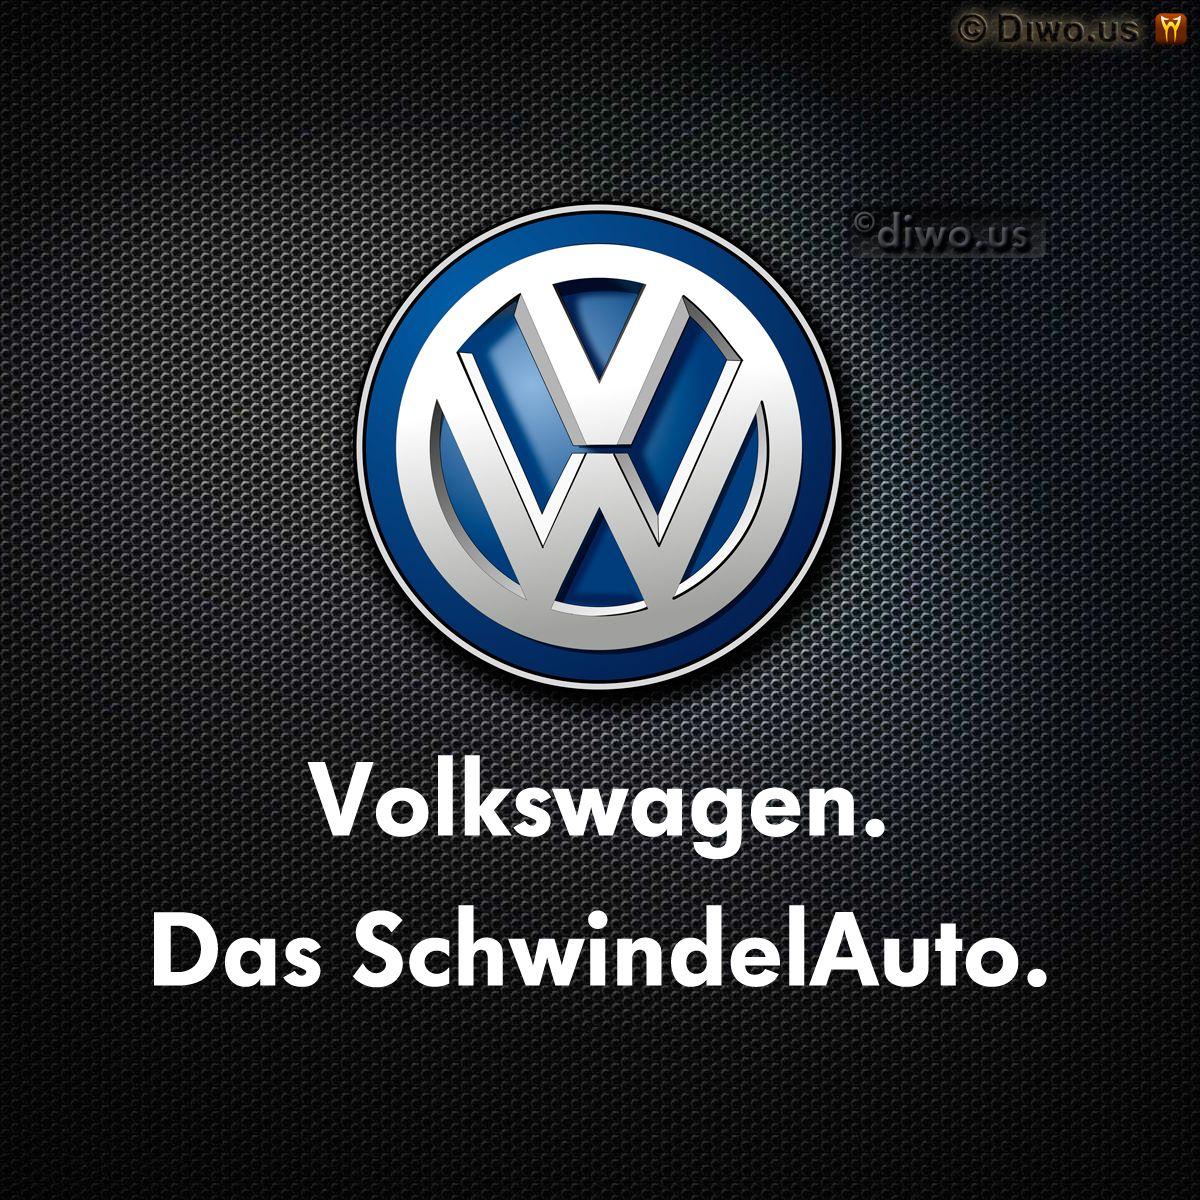 Diwous - Das SchwindelAuto, Volkswagen, Das Auto, scandal, cheat, cheating software, podvodný software, emise, skandál, aféra, emissions, EPA, engine, motor, STK, auto, schwindel, švindl, švindlauto, joke, vtip, logo